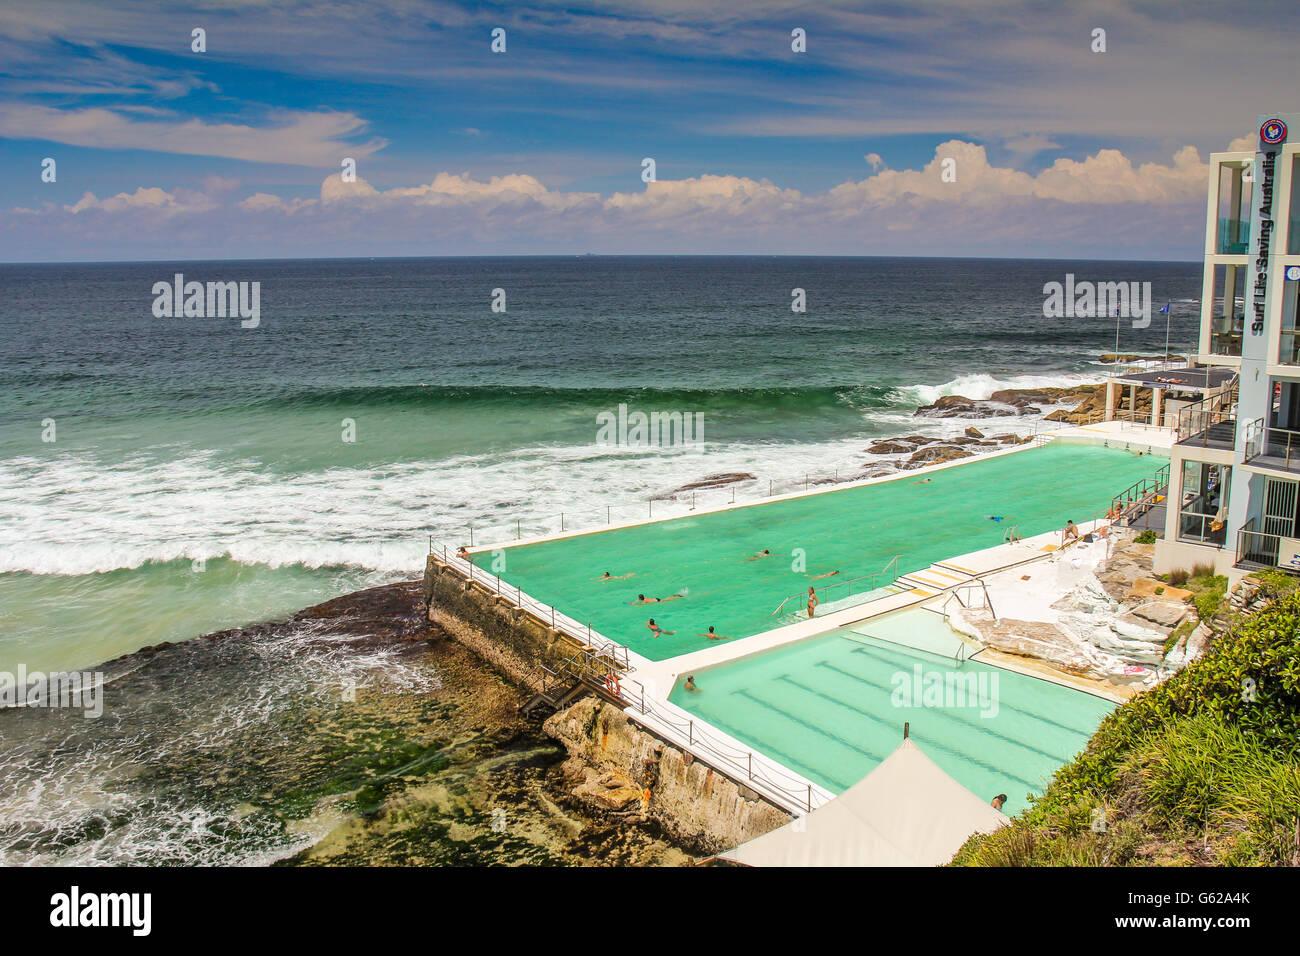 Swimming Pool In Bondi Beach Sydney Australia Stock Photo Royalty Free Image 107002019 Alamy